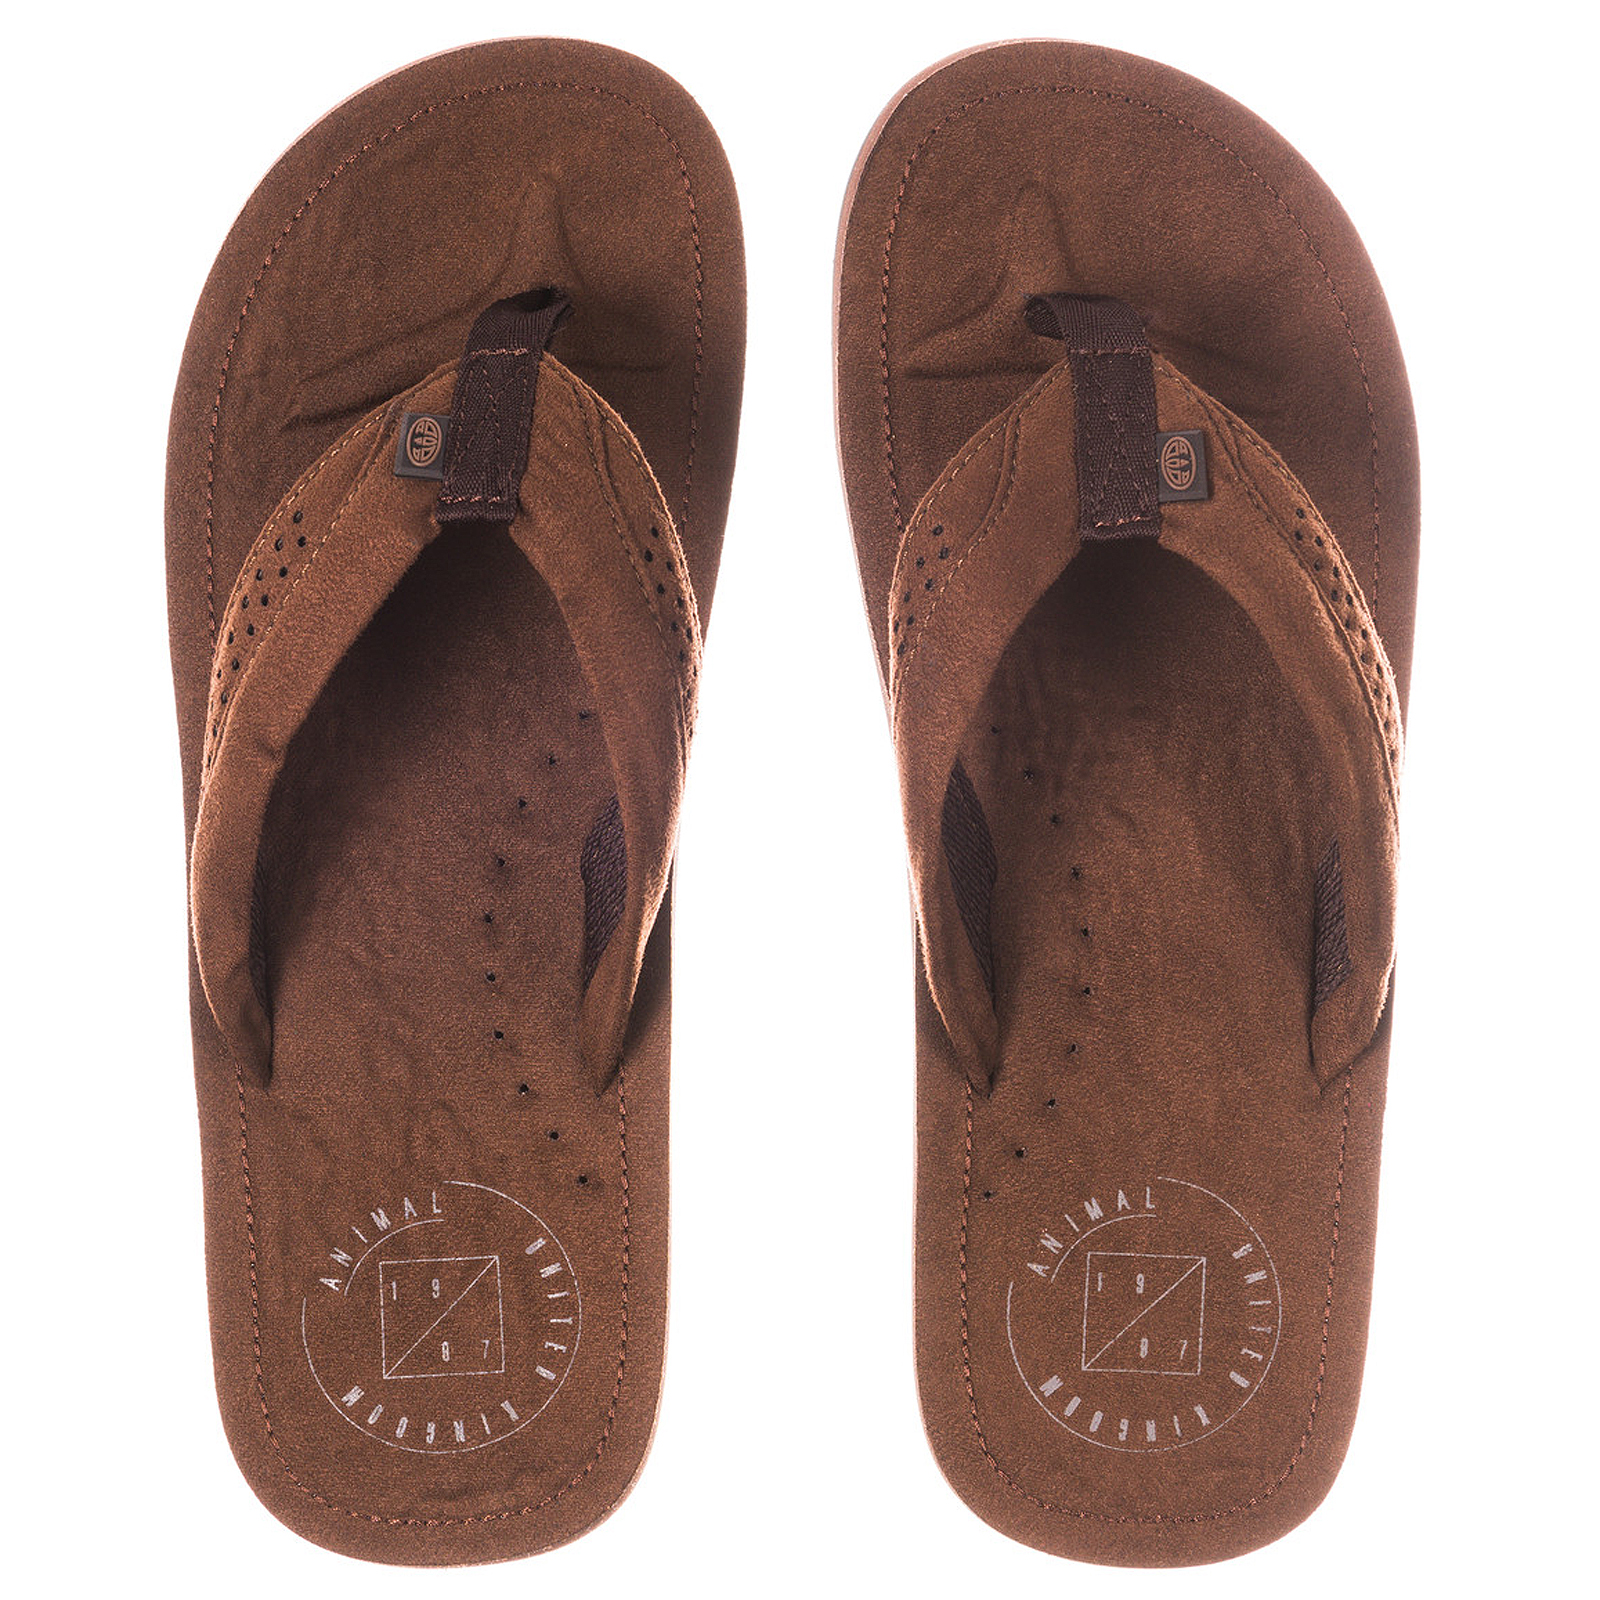 Animal Hombre Hyde Summer On Beach Holiday Slip On Summer Thongs Sandals Flip Flops d3563c